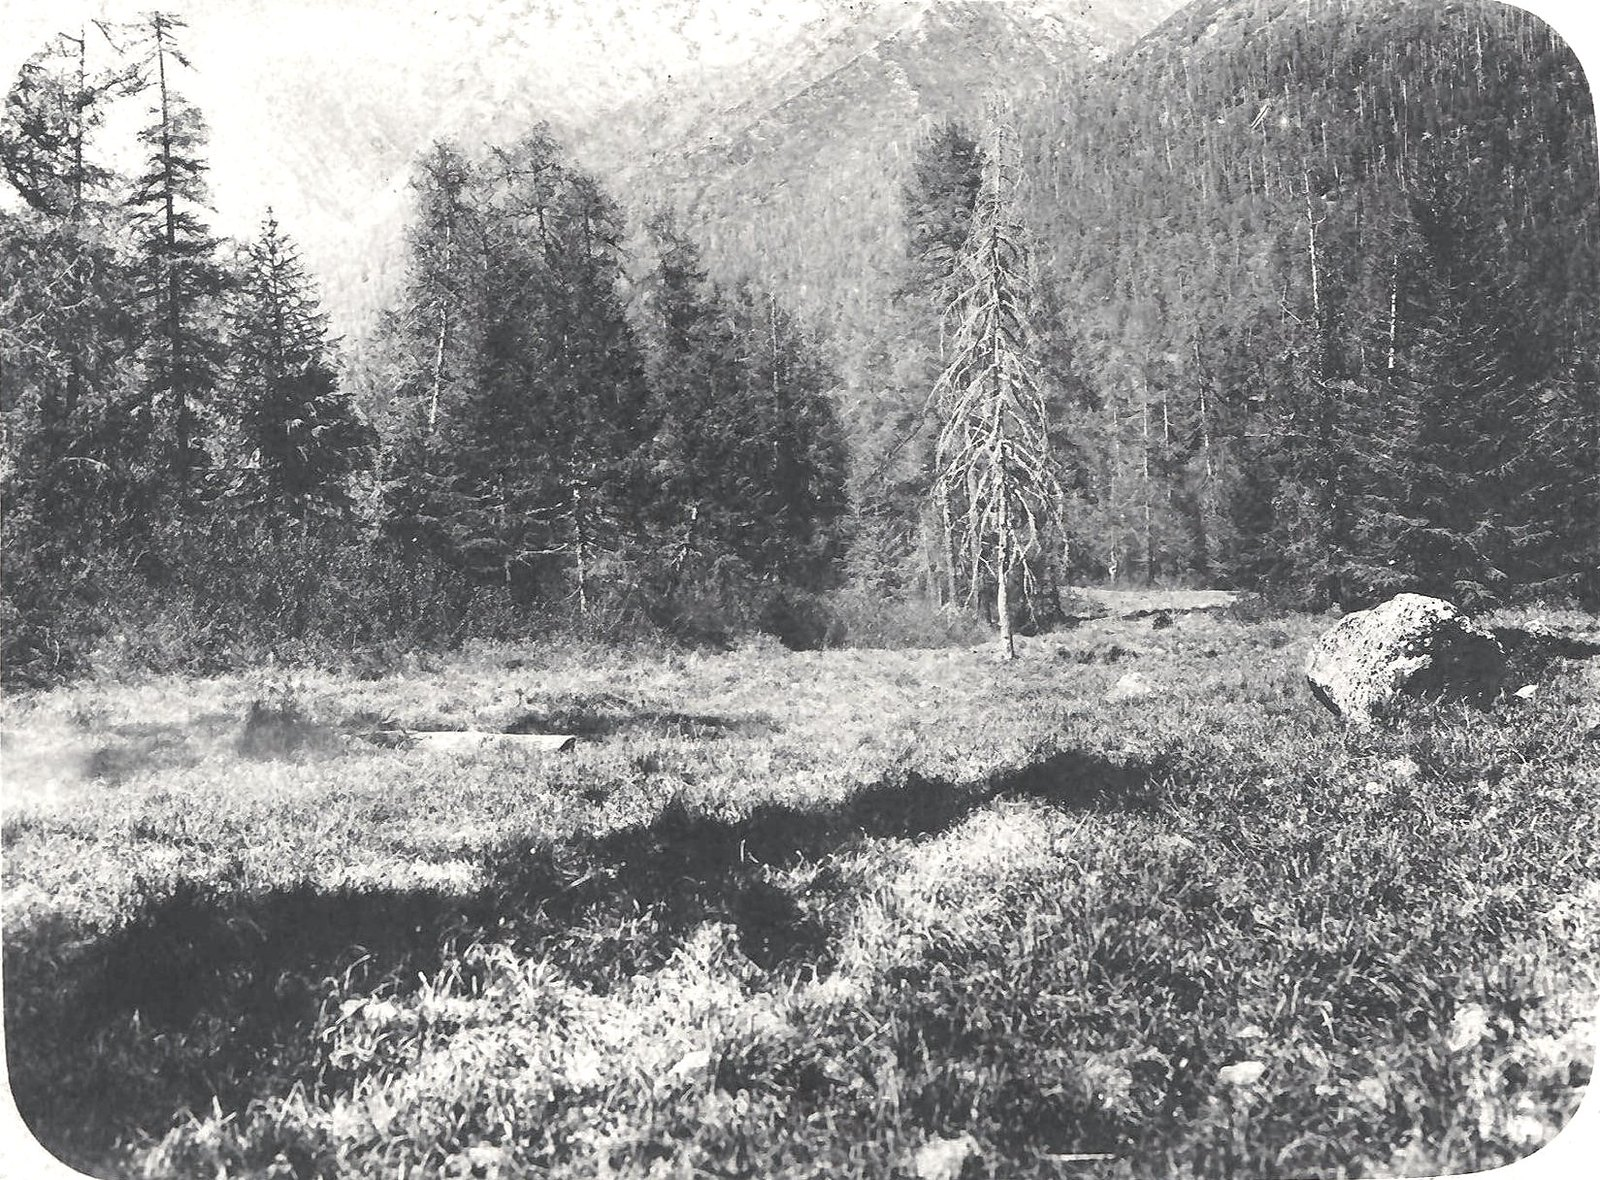 07. Долина реки Большой Туксаньи